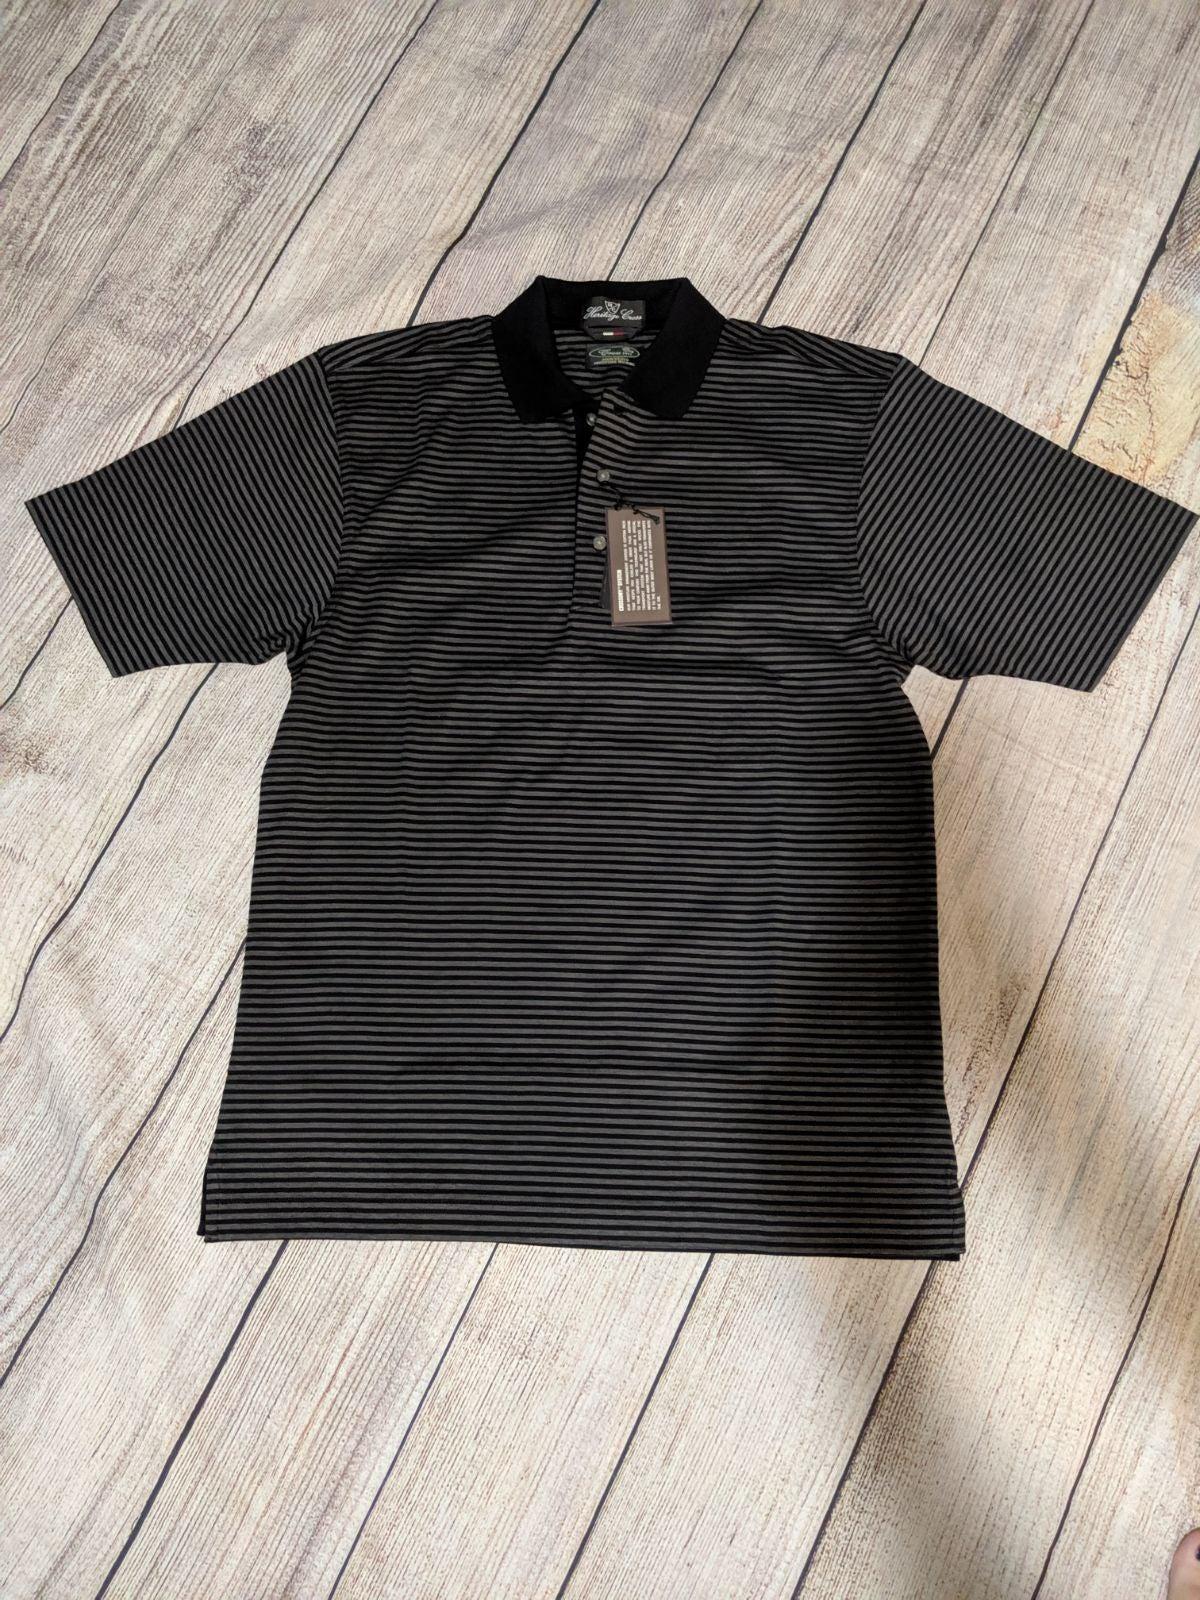 heritage cross Polo golf shirt